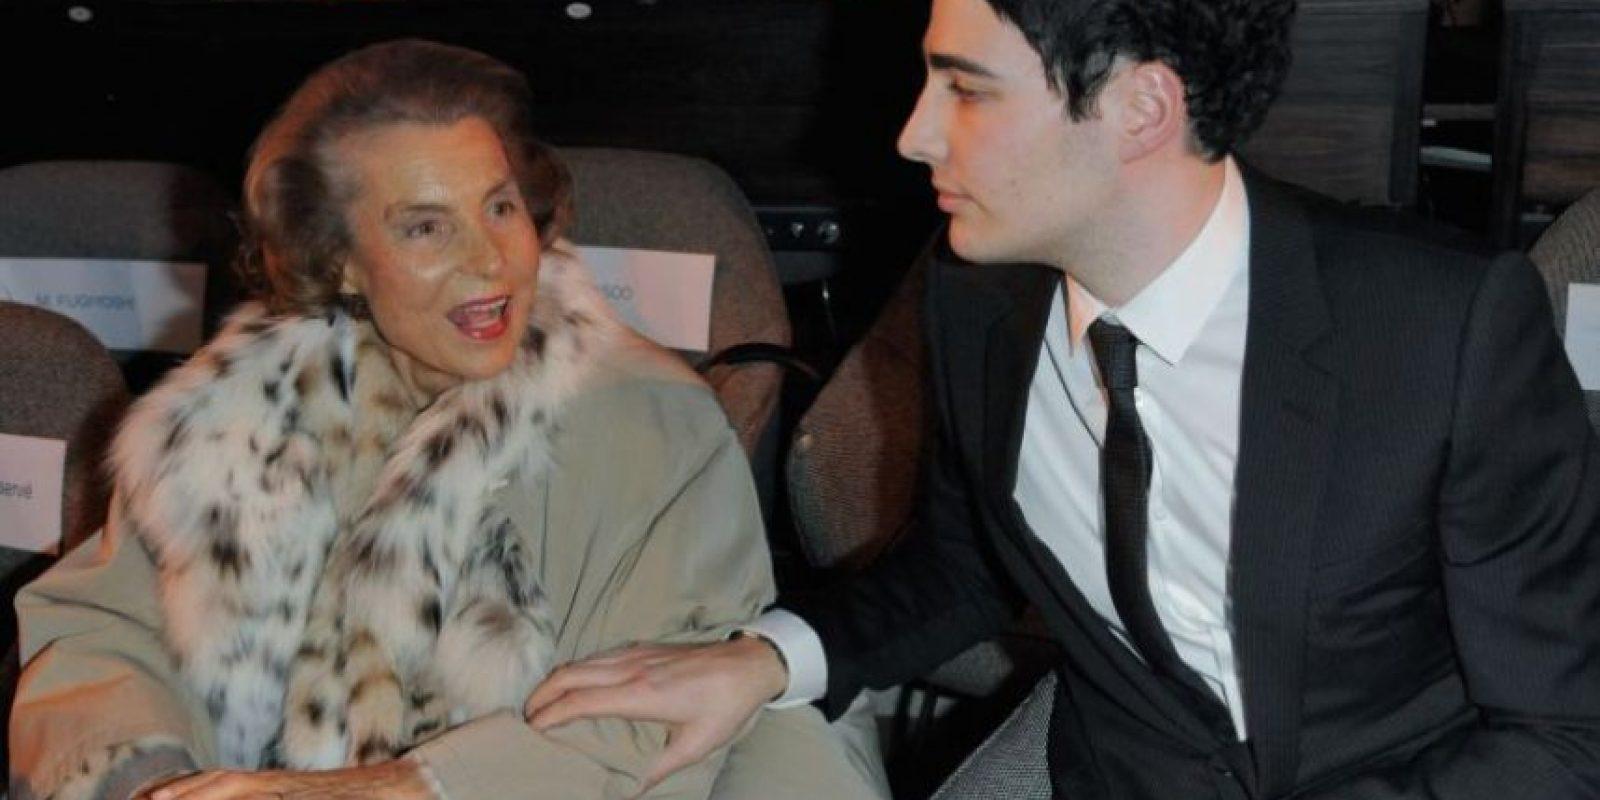 2. Liliane Bettencourt, de origen francés, es la heredera principal de la compañía L'Oreal. Foto:Getty Images